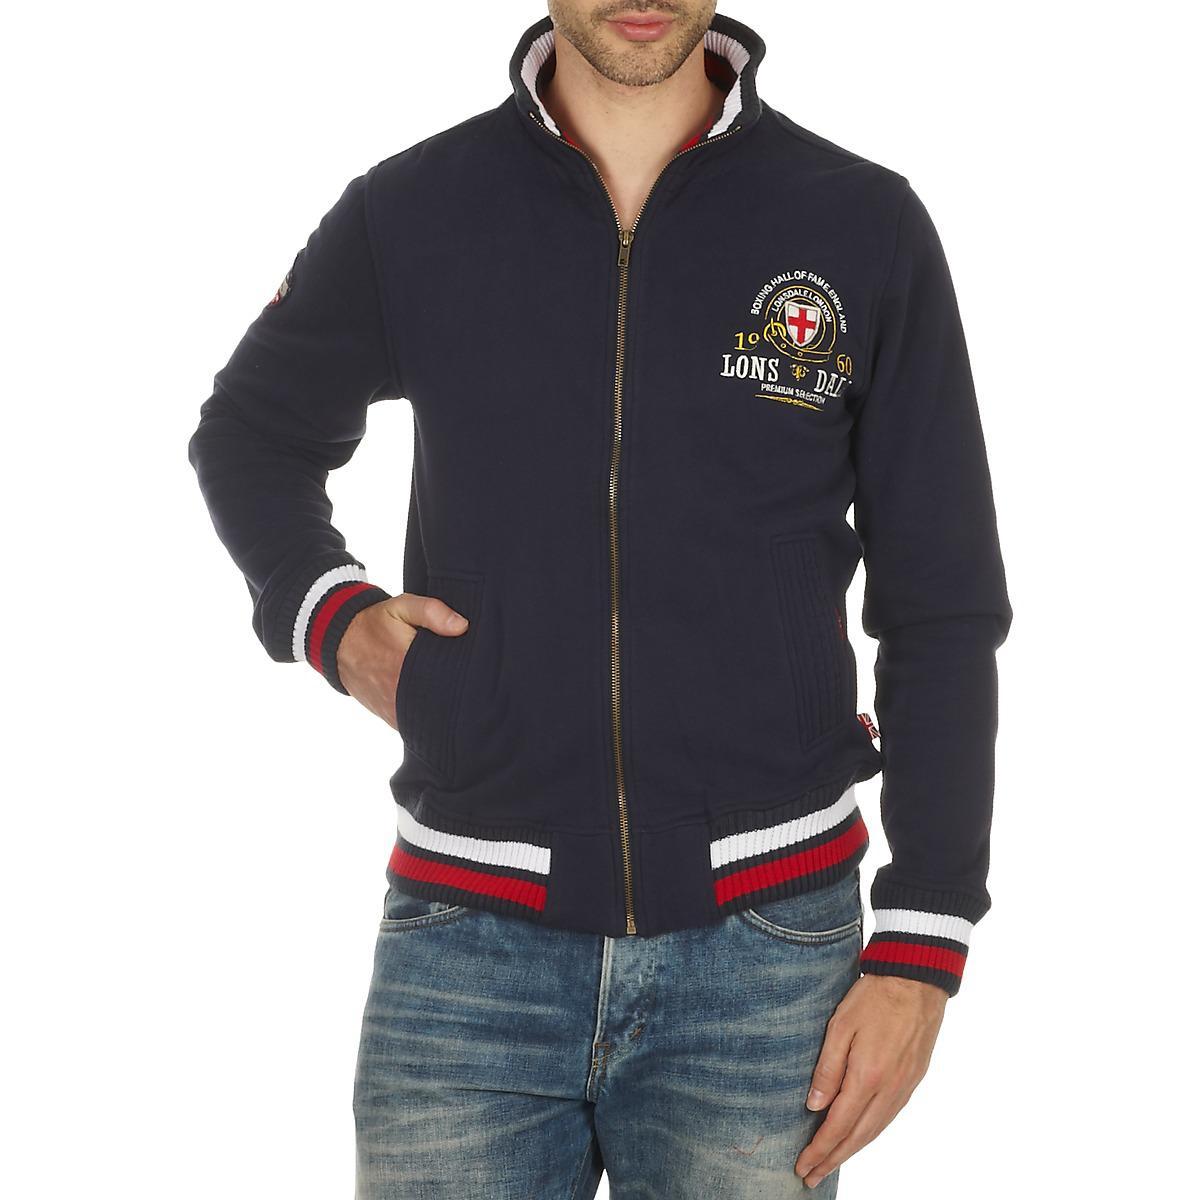 Palemo Jaket Sweater Polos Hoodie Jumper Biru Navy Unisex Daftar Zipper Dongker Regattasport Men Source Blue Update Harga Terbaru